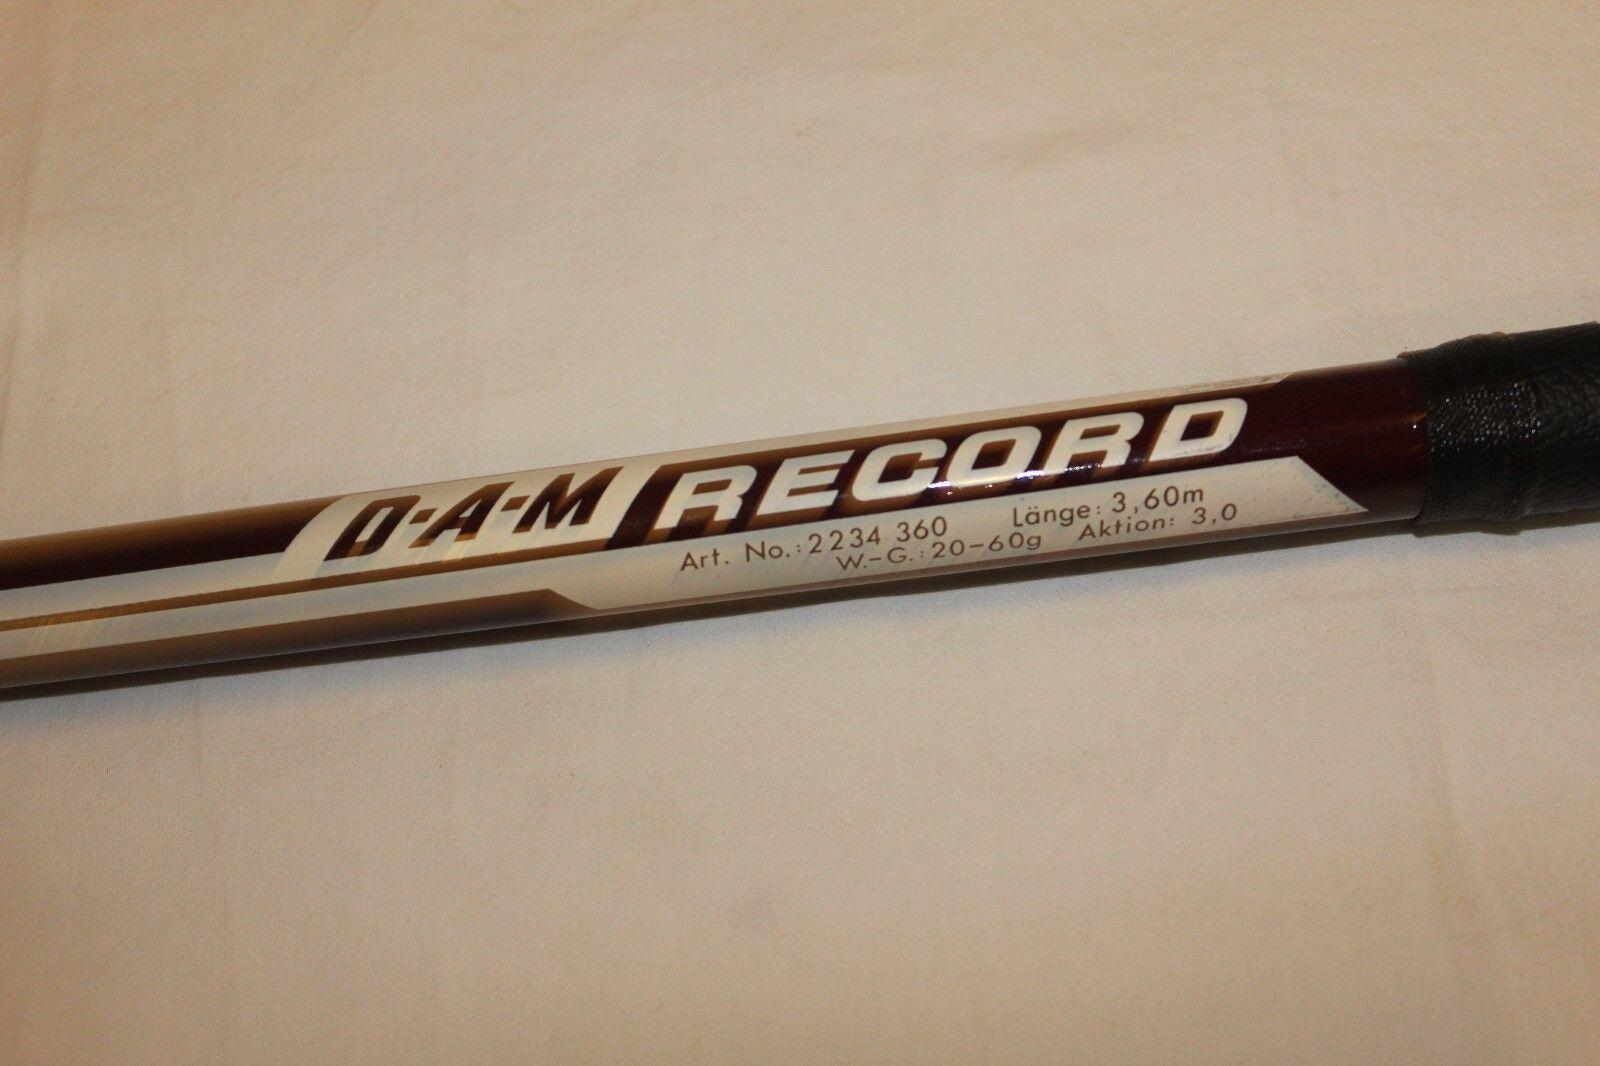 Dam record-telerute record-telerute record-telerute - 3,60m-wg: 20-60g-nr-438 167f29